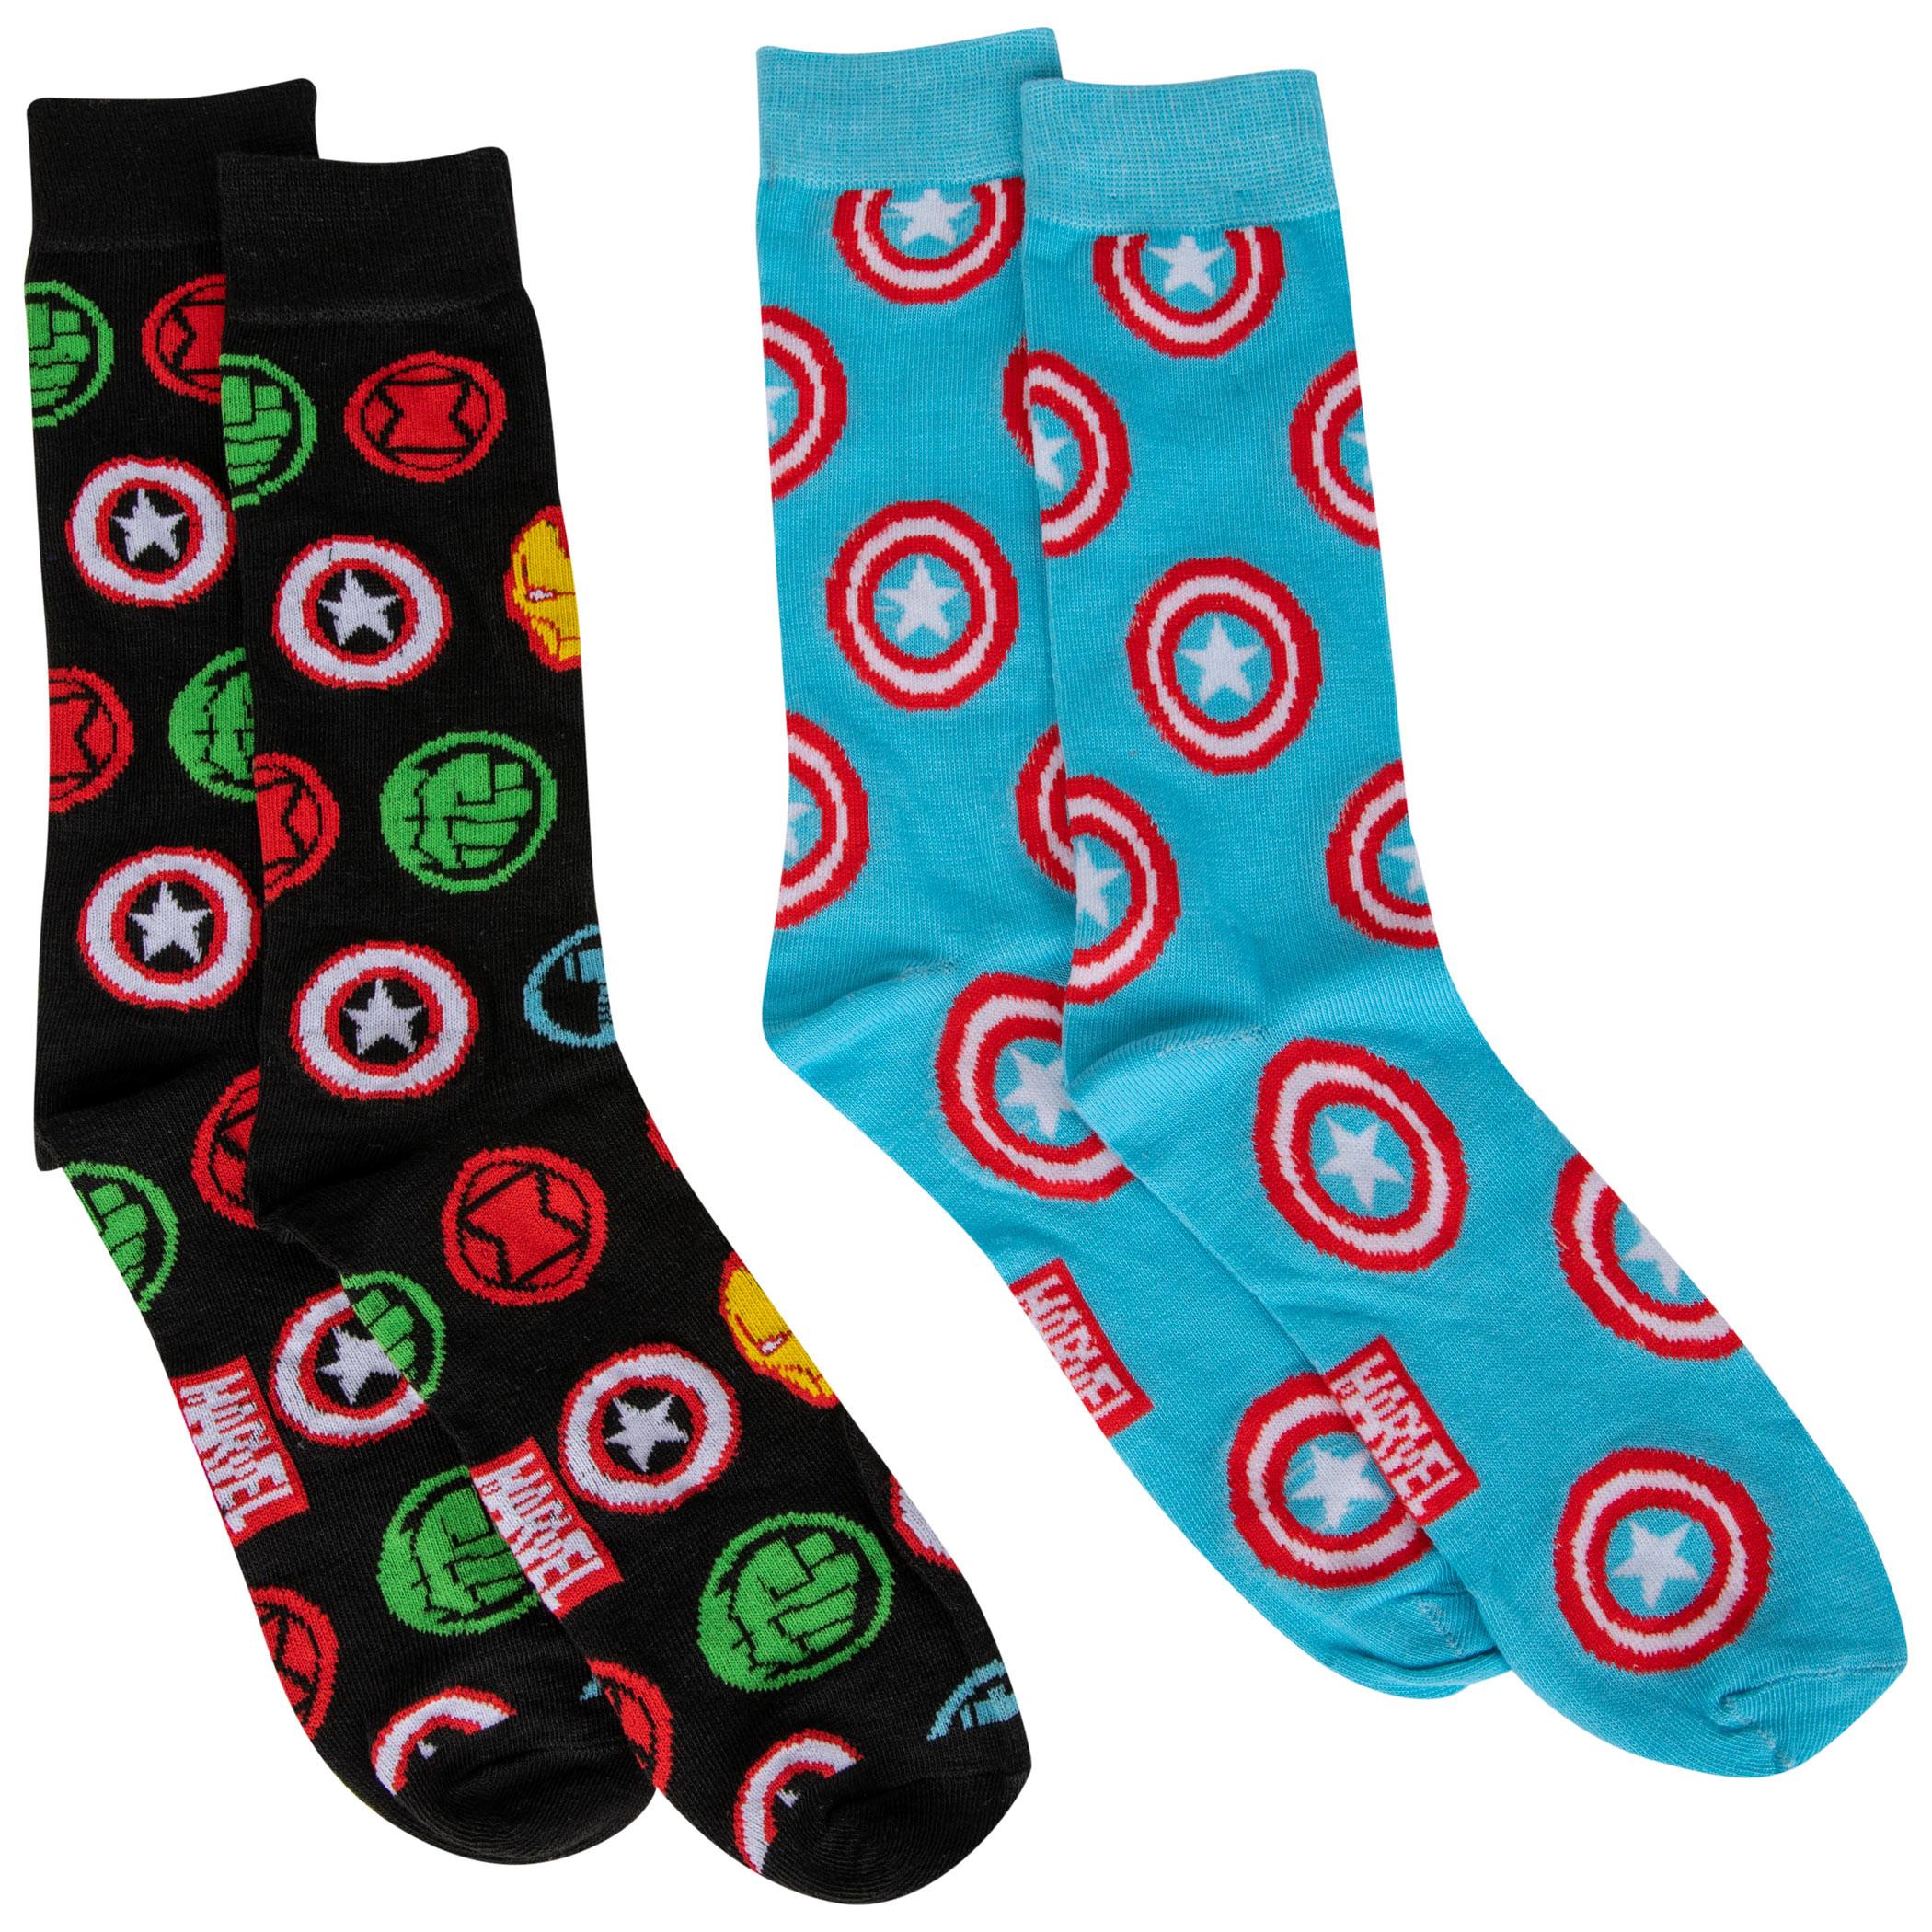 Captain America and Marvel Avengers Symbols 2-Pair Pack of Crew Socks